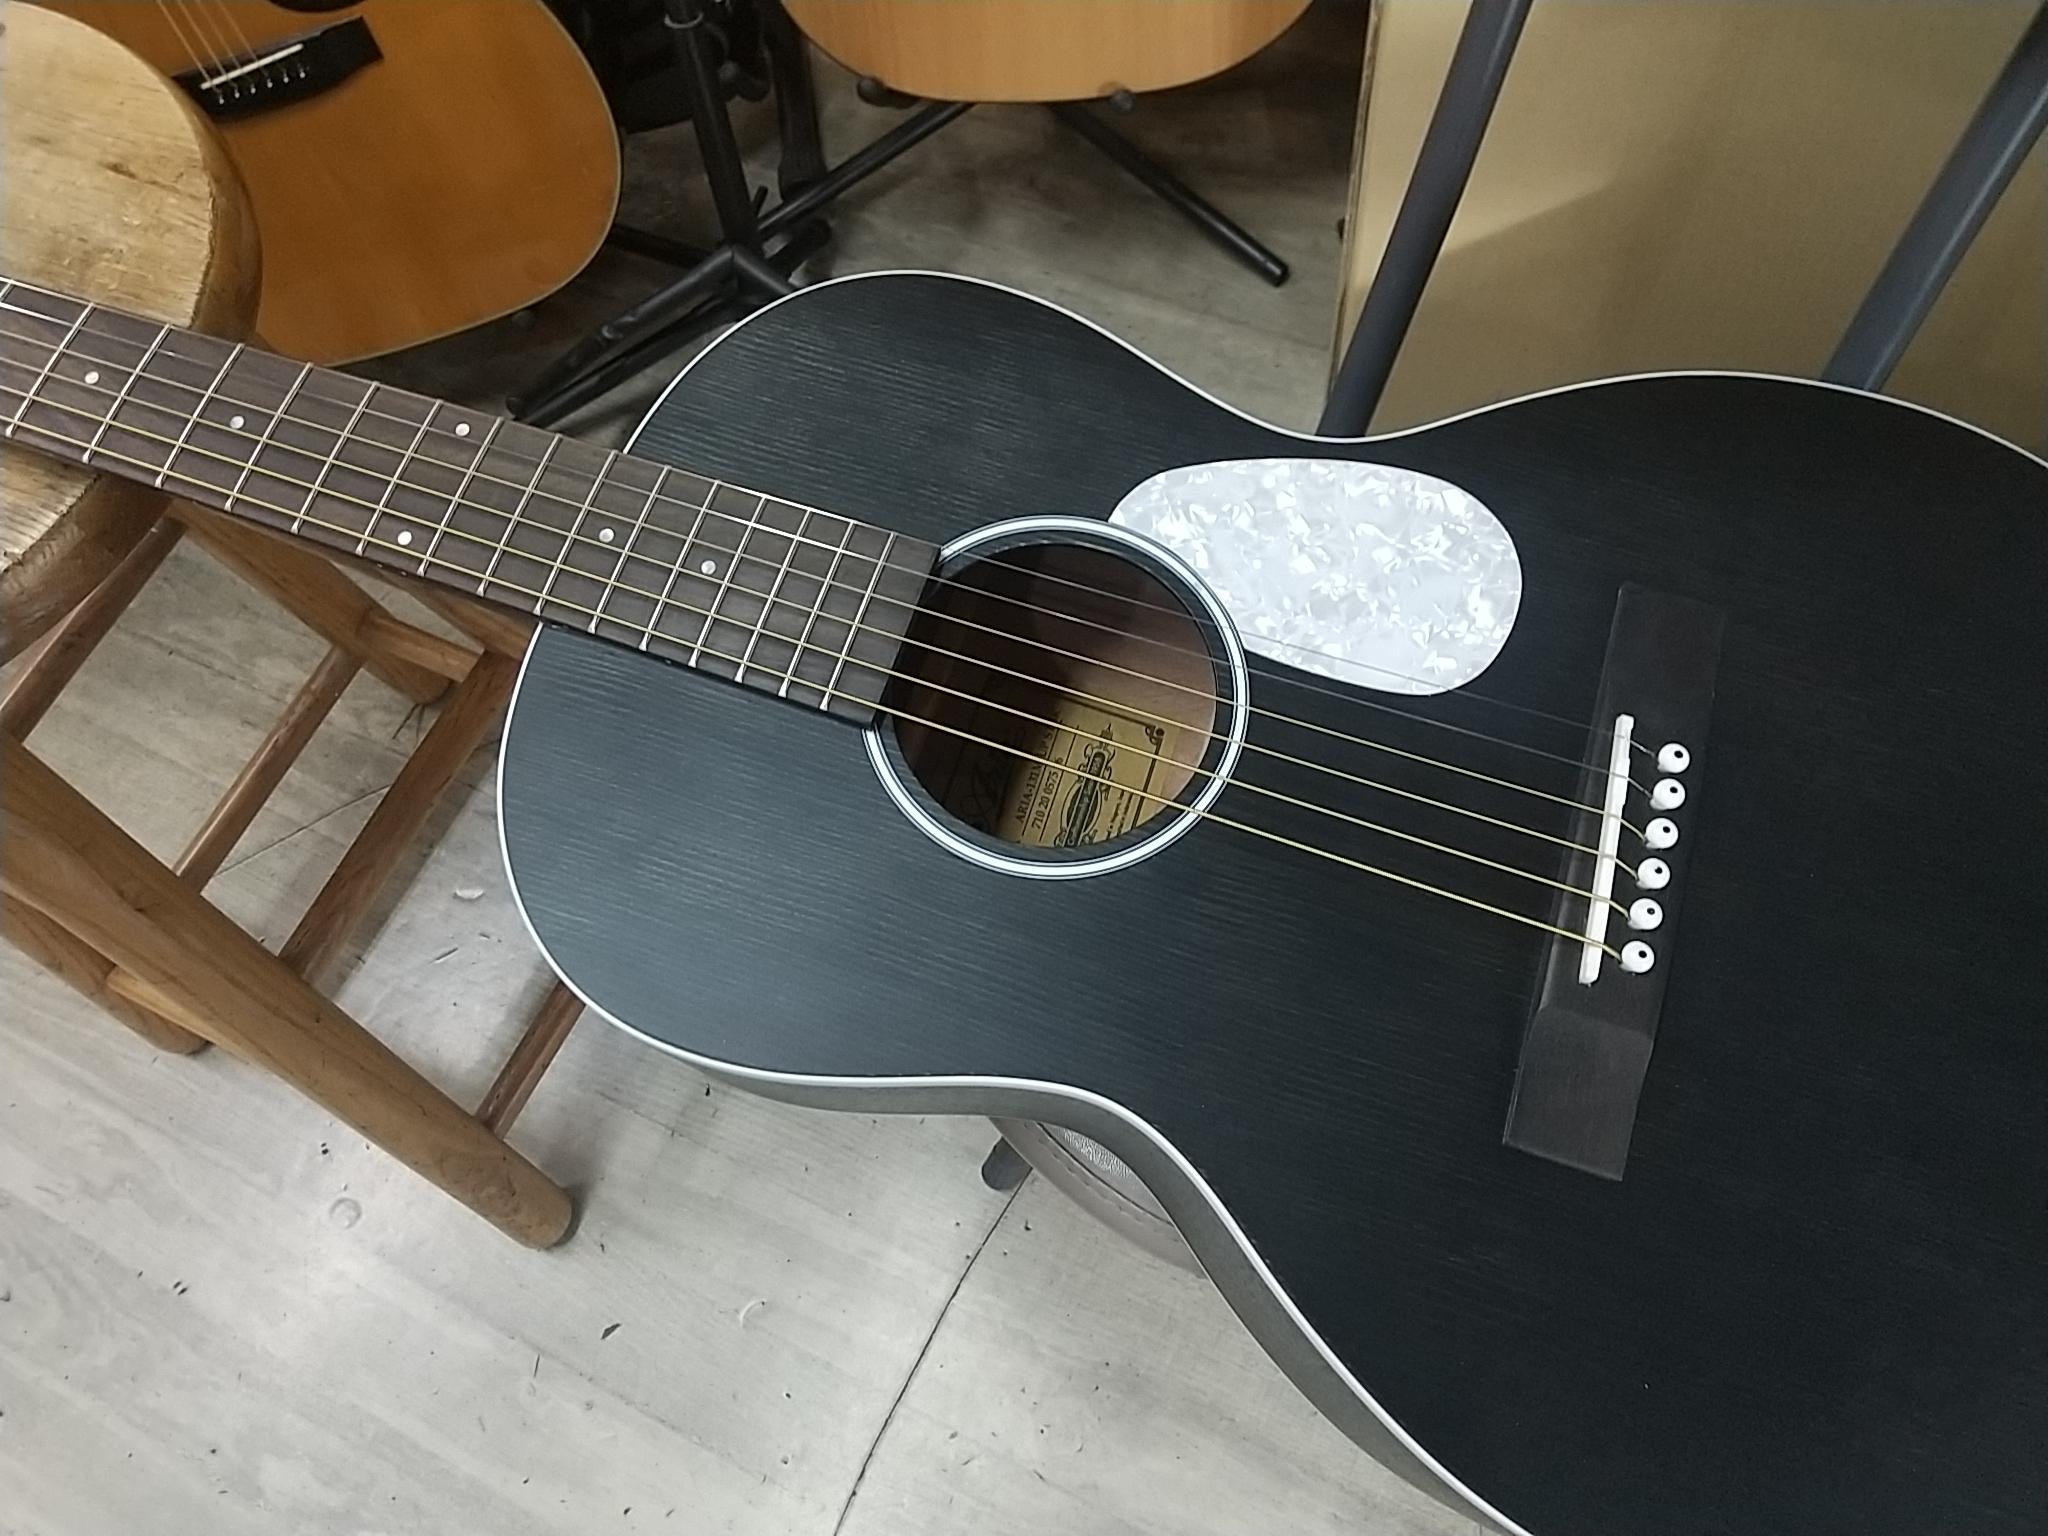 Aria-131M UP STBK Urban Player パーラーギター アリア 131 ブラック 黒 BLACK ピックアップ付き